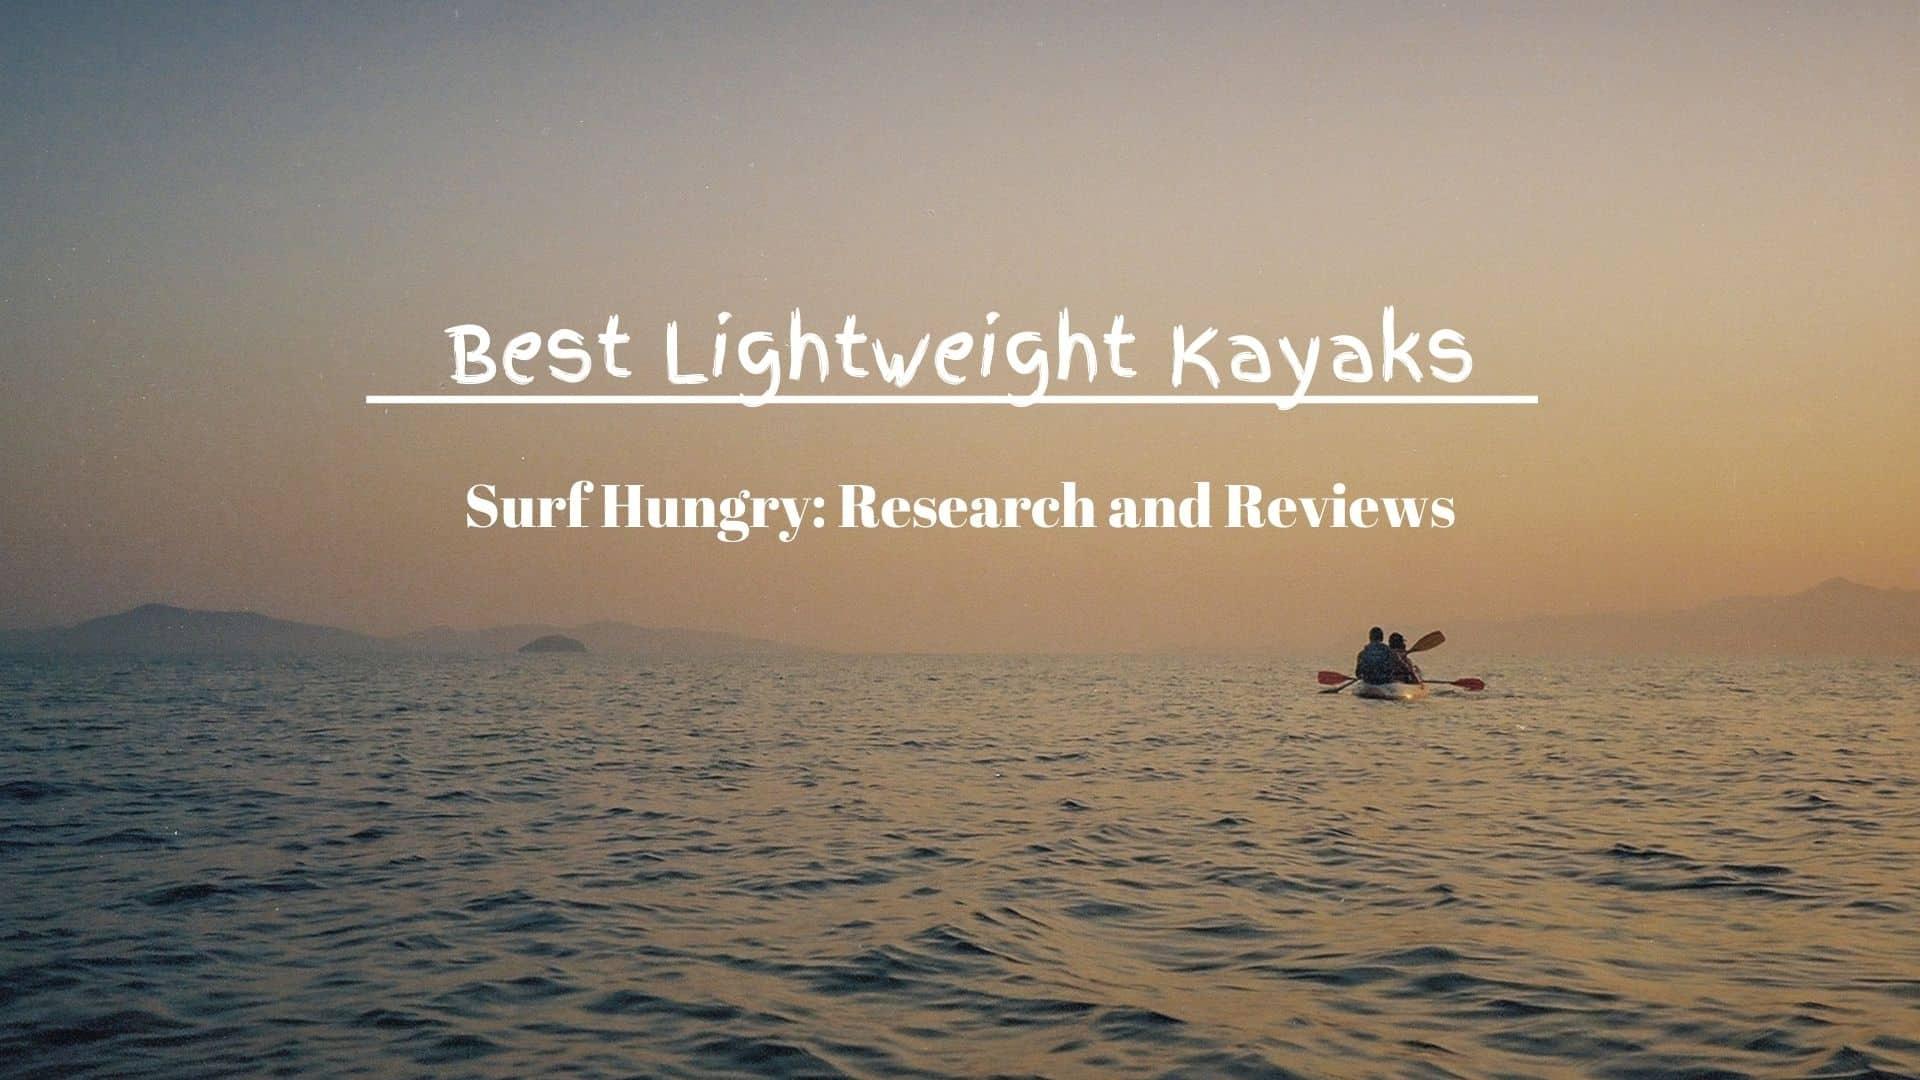 best lightweight kayaks